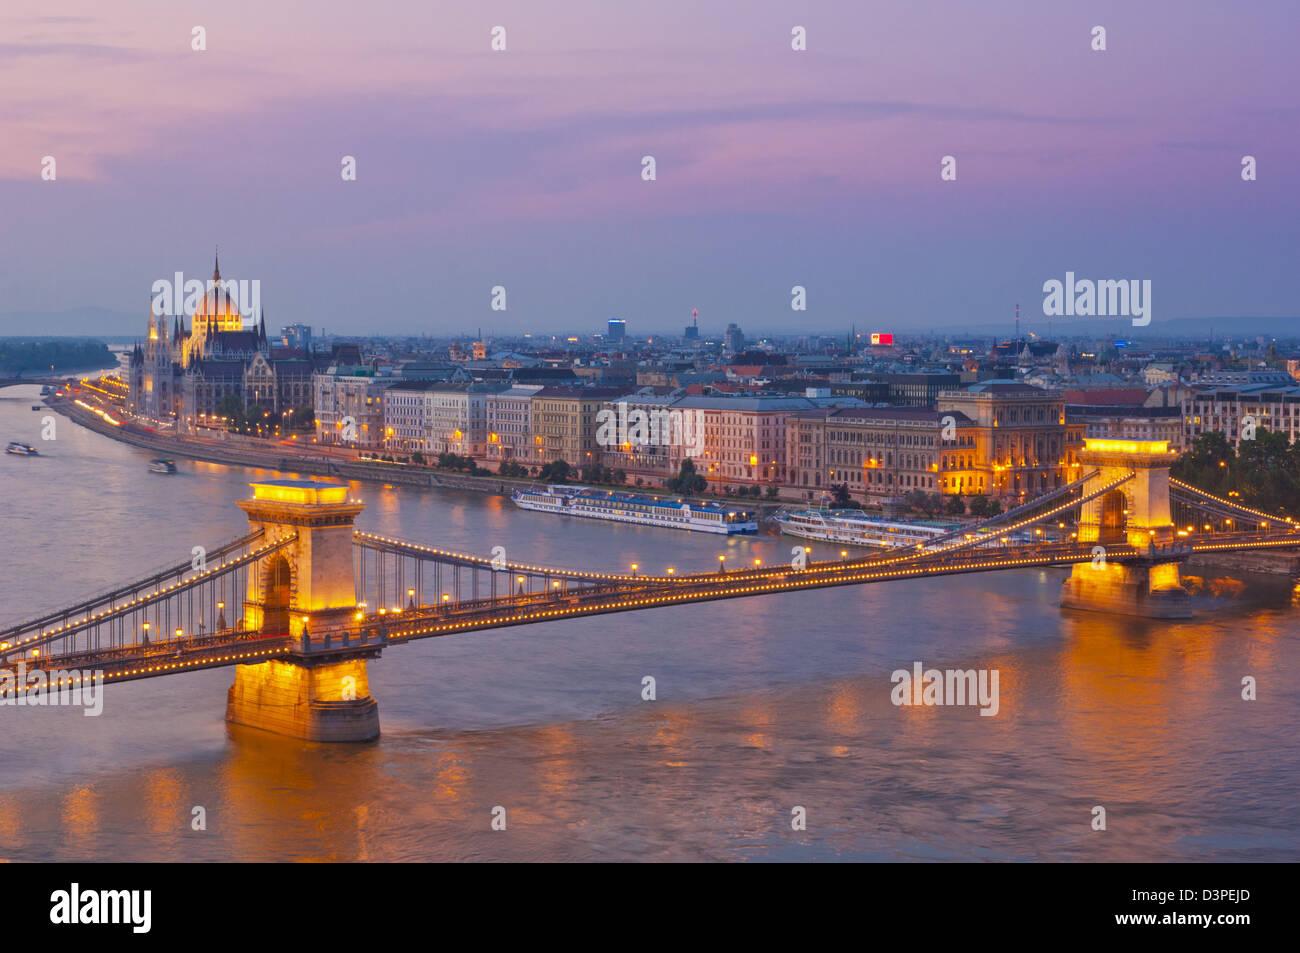 The Chain Bridge, Szechenyi Lanchid, over the river Danube at night  Budapest, Hungary, Europe, EU - Stock Image